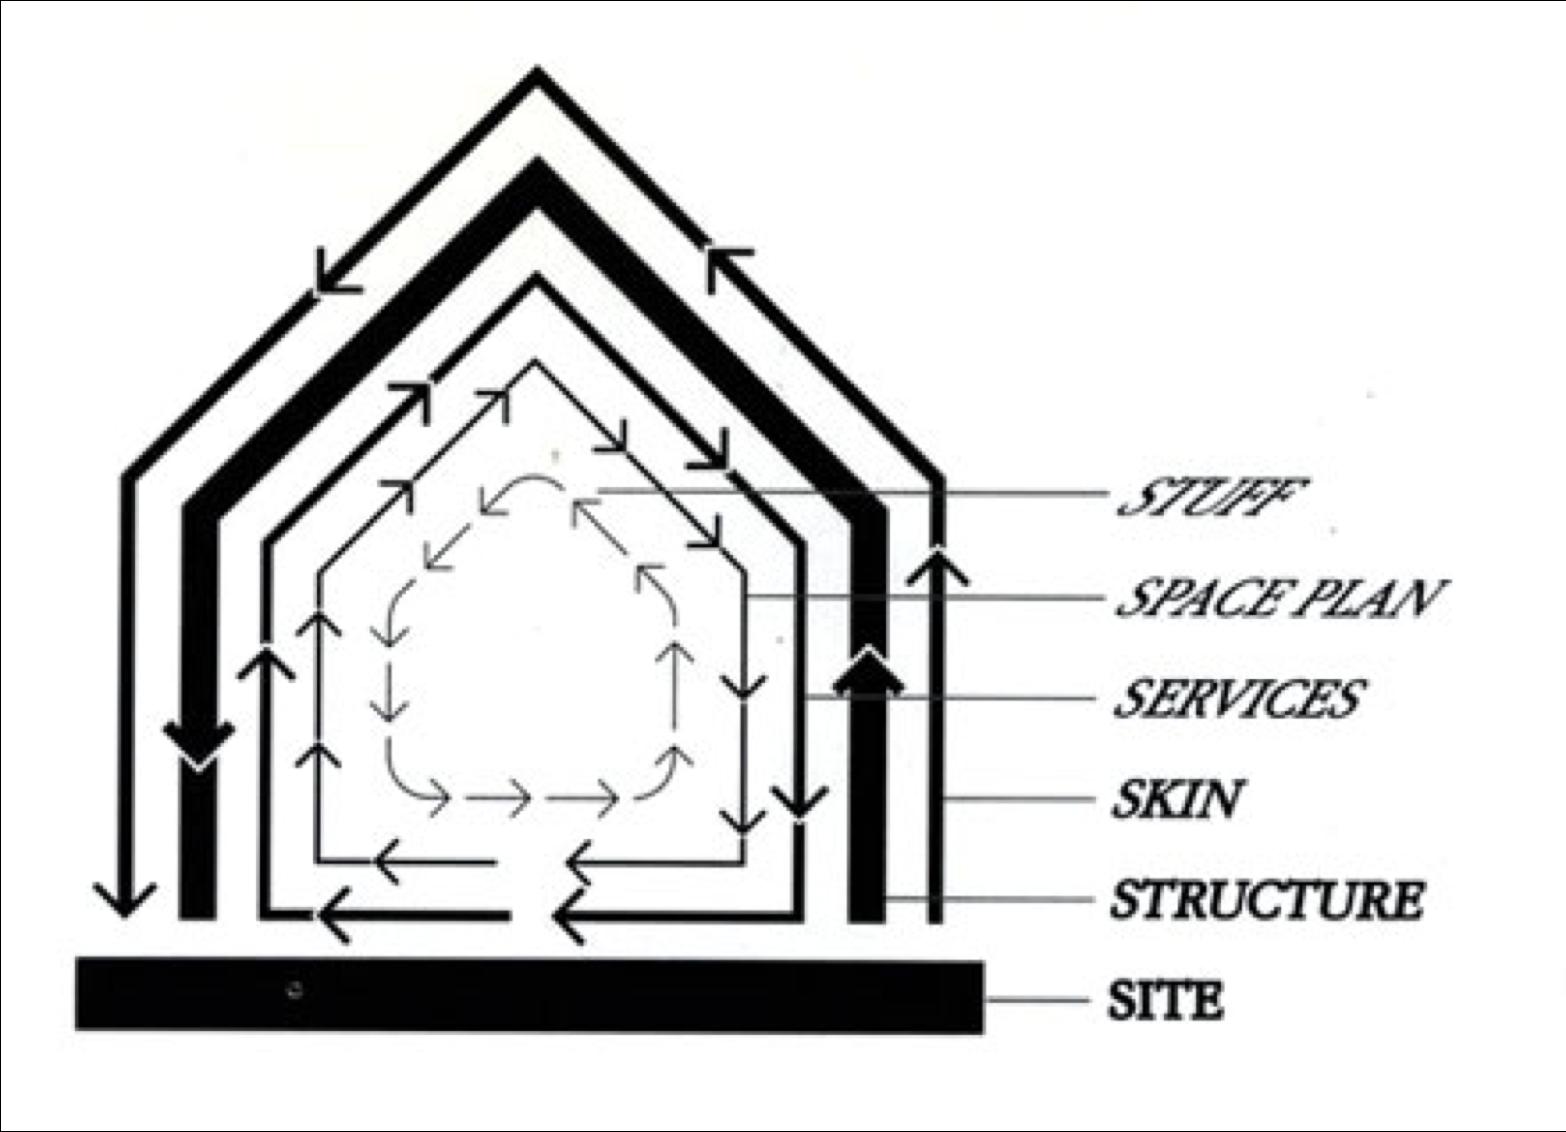 Shearing Layers of Change, by Stewart Brand